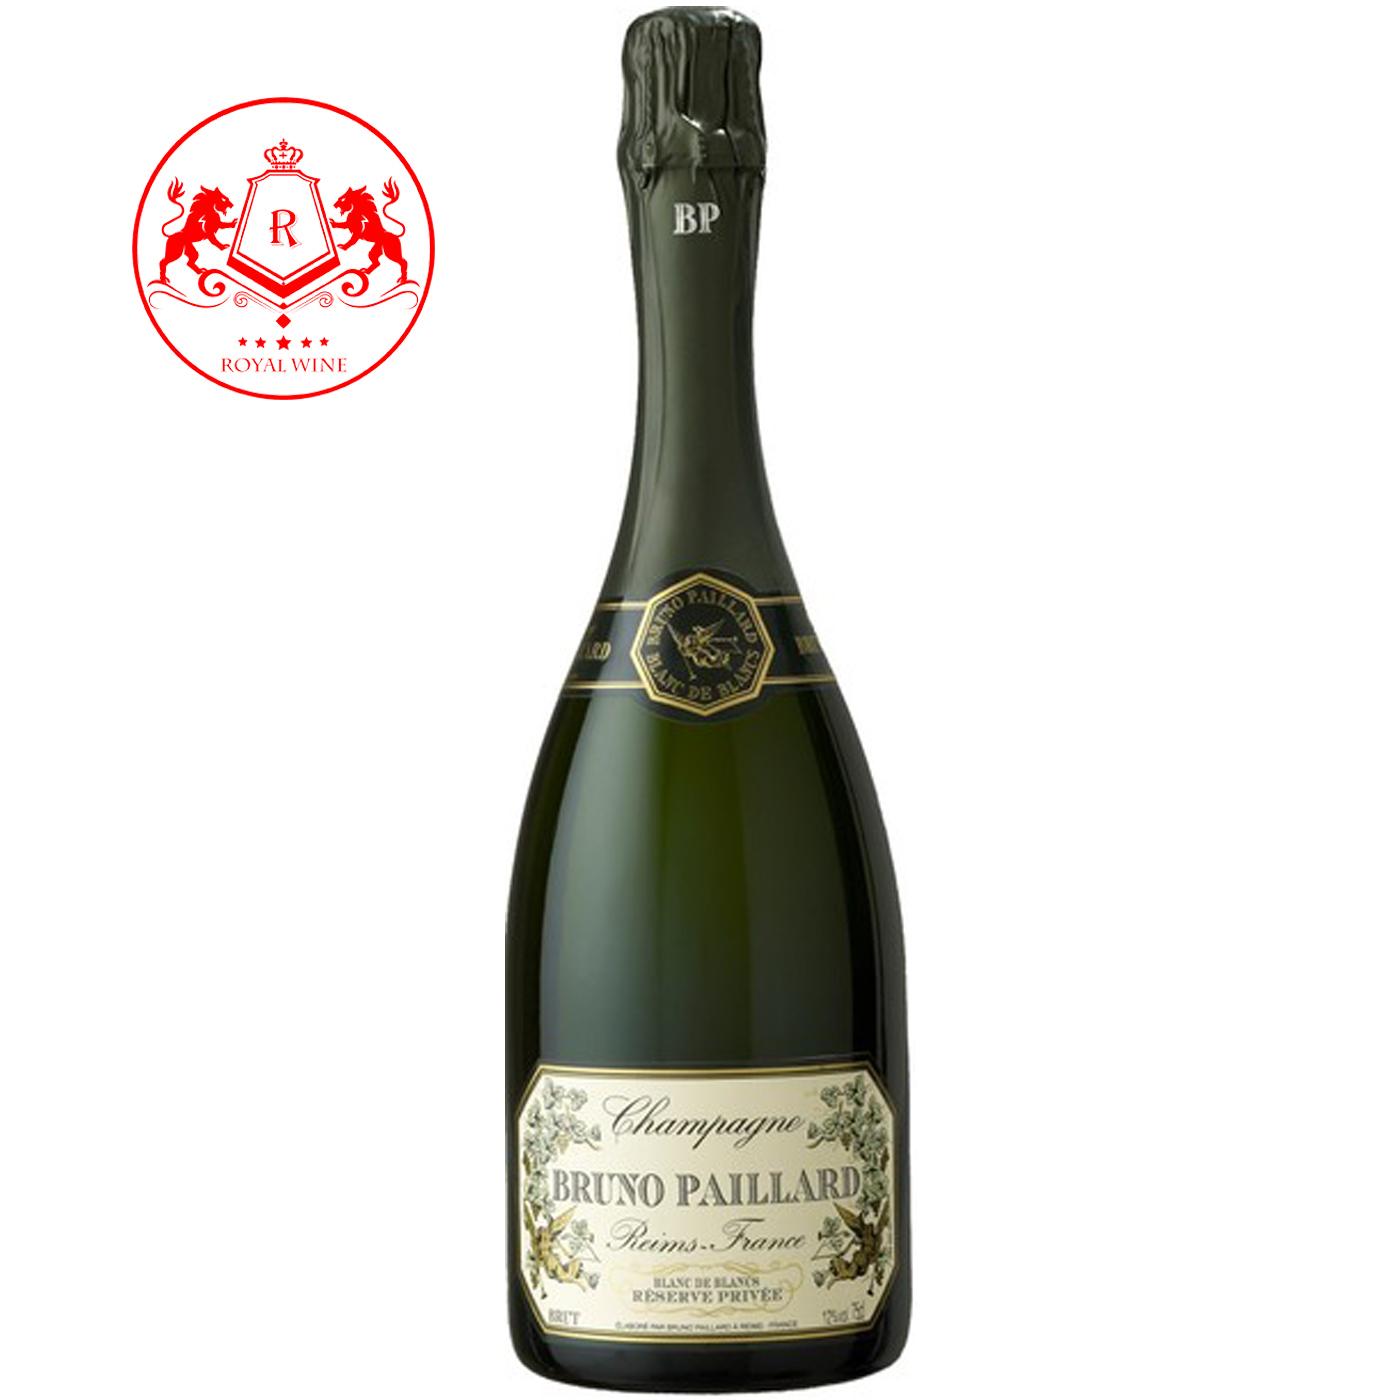 Champagne BRUNO PAILLARD Blanc de Blanc Reserve Privee